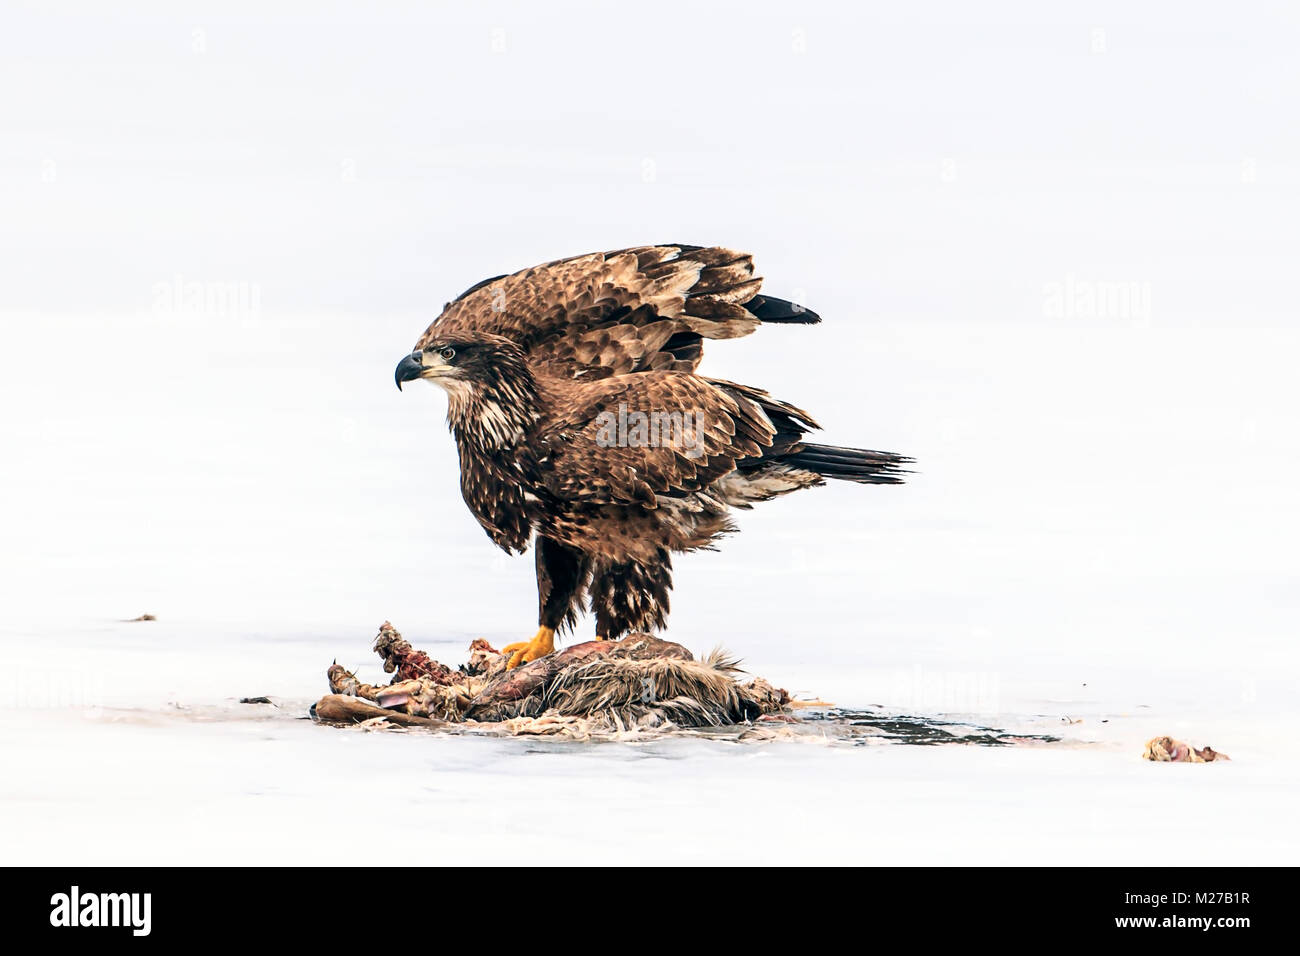 Unreife kahler Adler flattert Flügel mit toten Tier auf dem gefrorenen Hauser See in Idaho. Stockbild